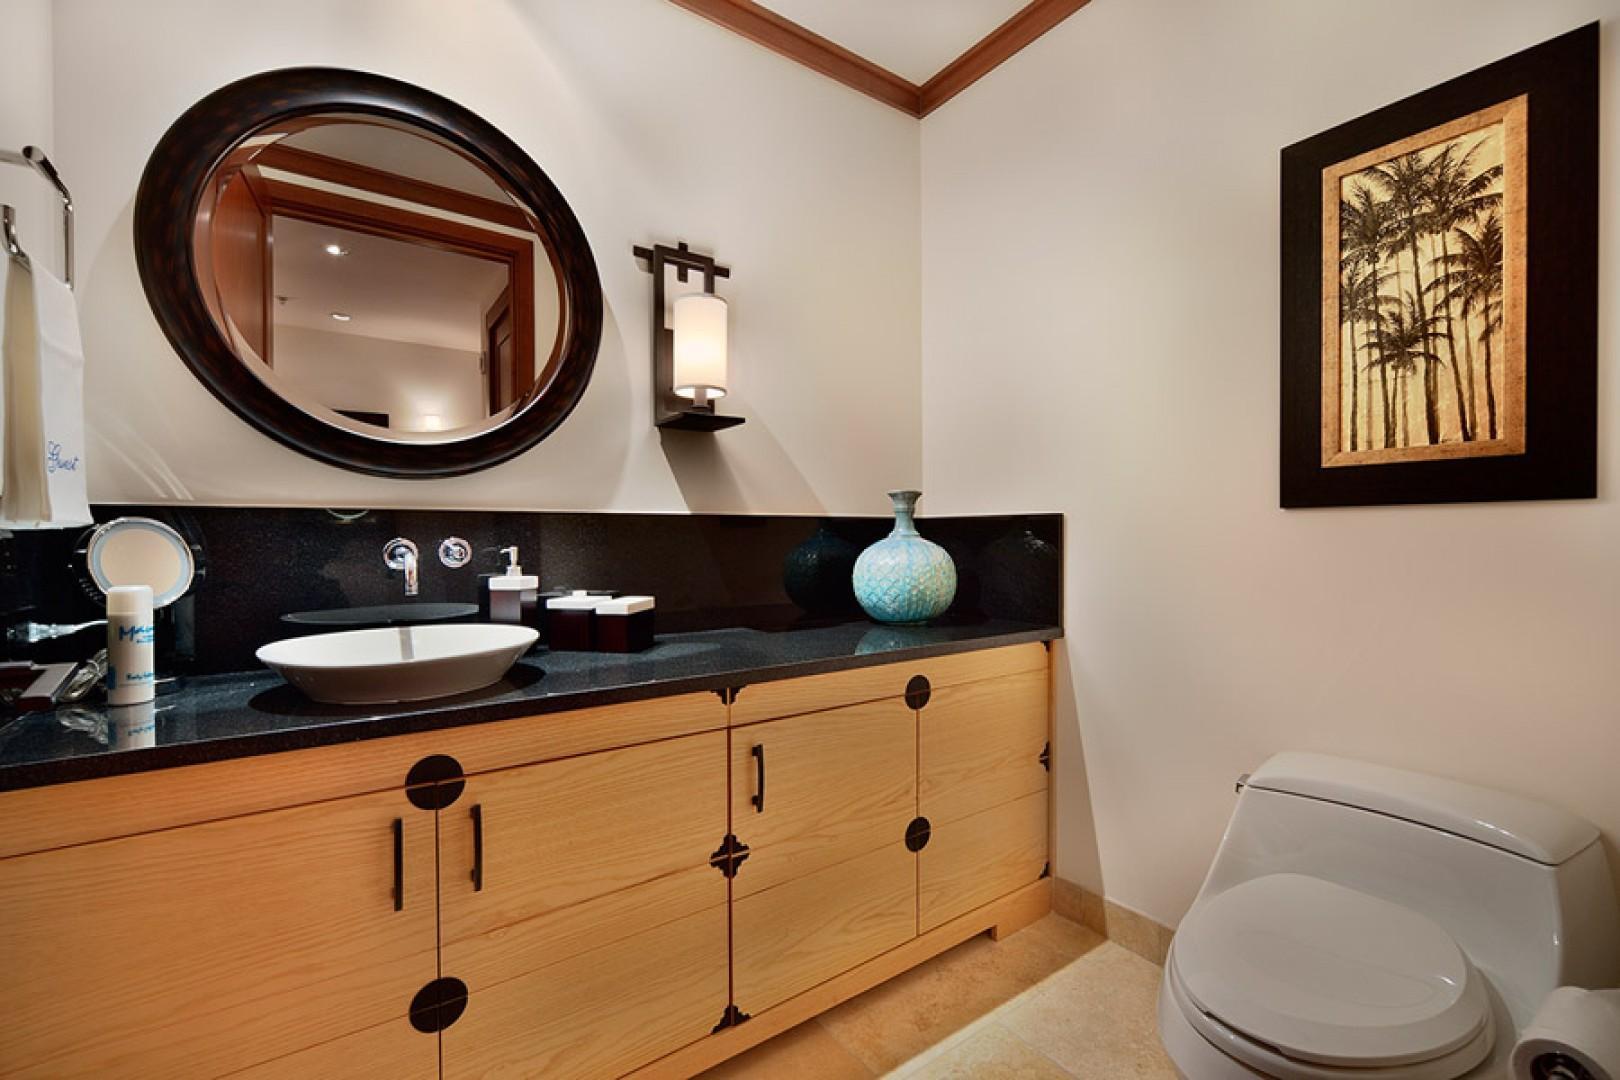 Sea Mist Villa 2403 - Guest Powder Room Located Between Bedrooms and Great Room